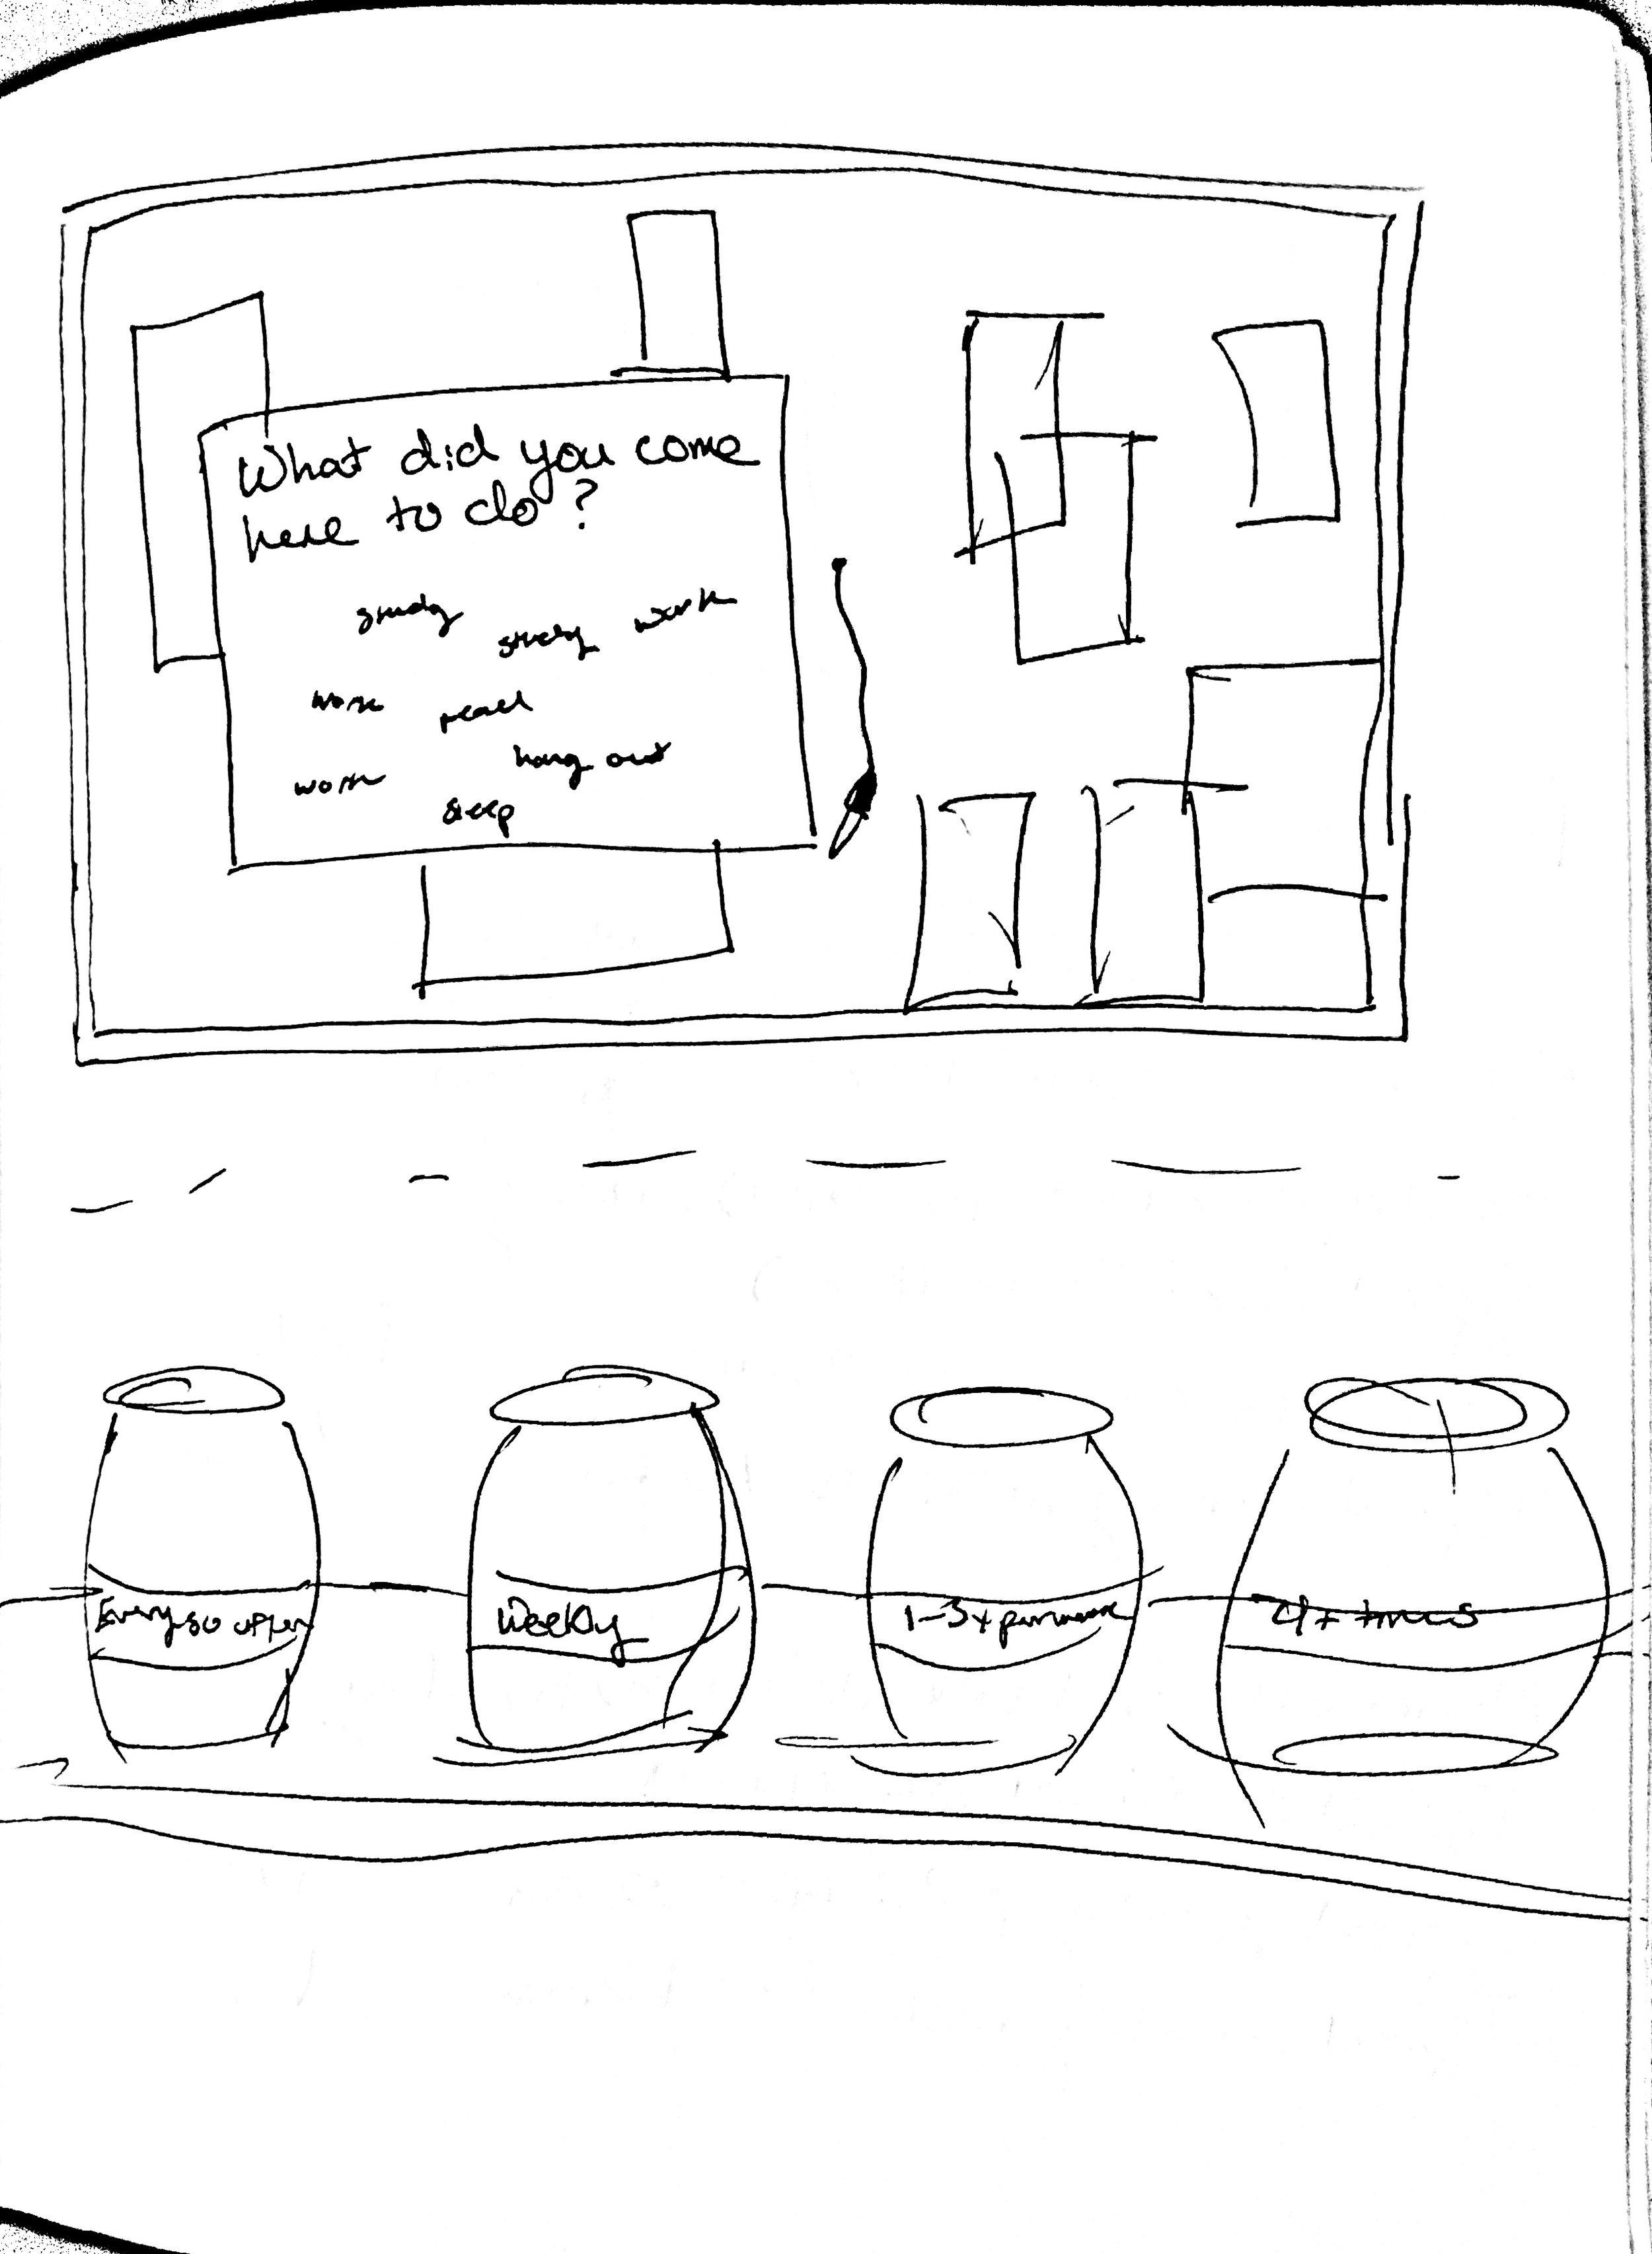 Sketch of potential methods in context